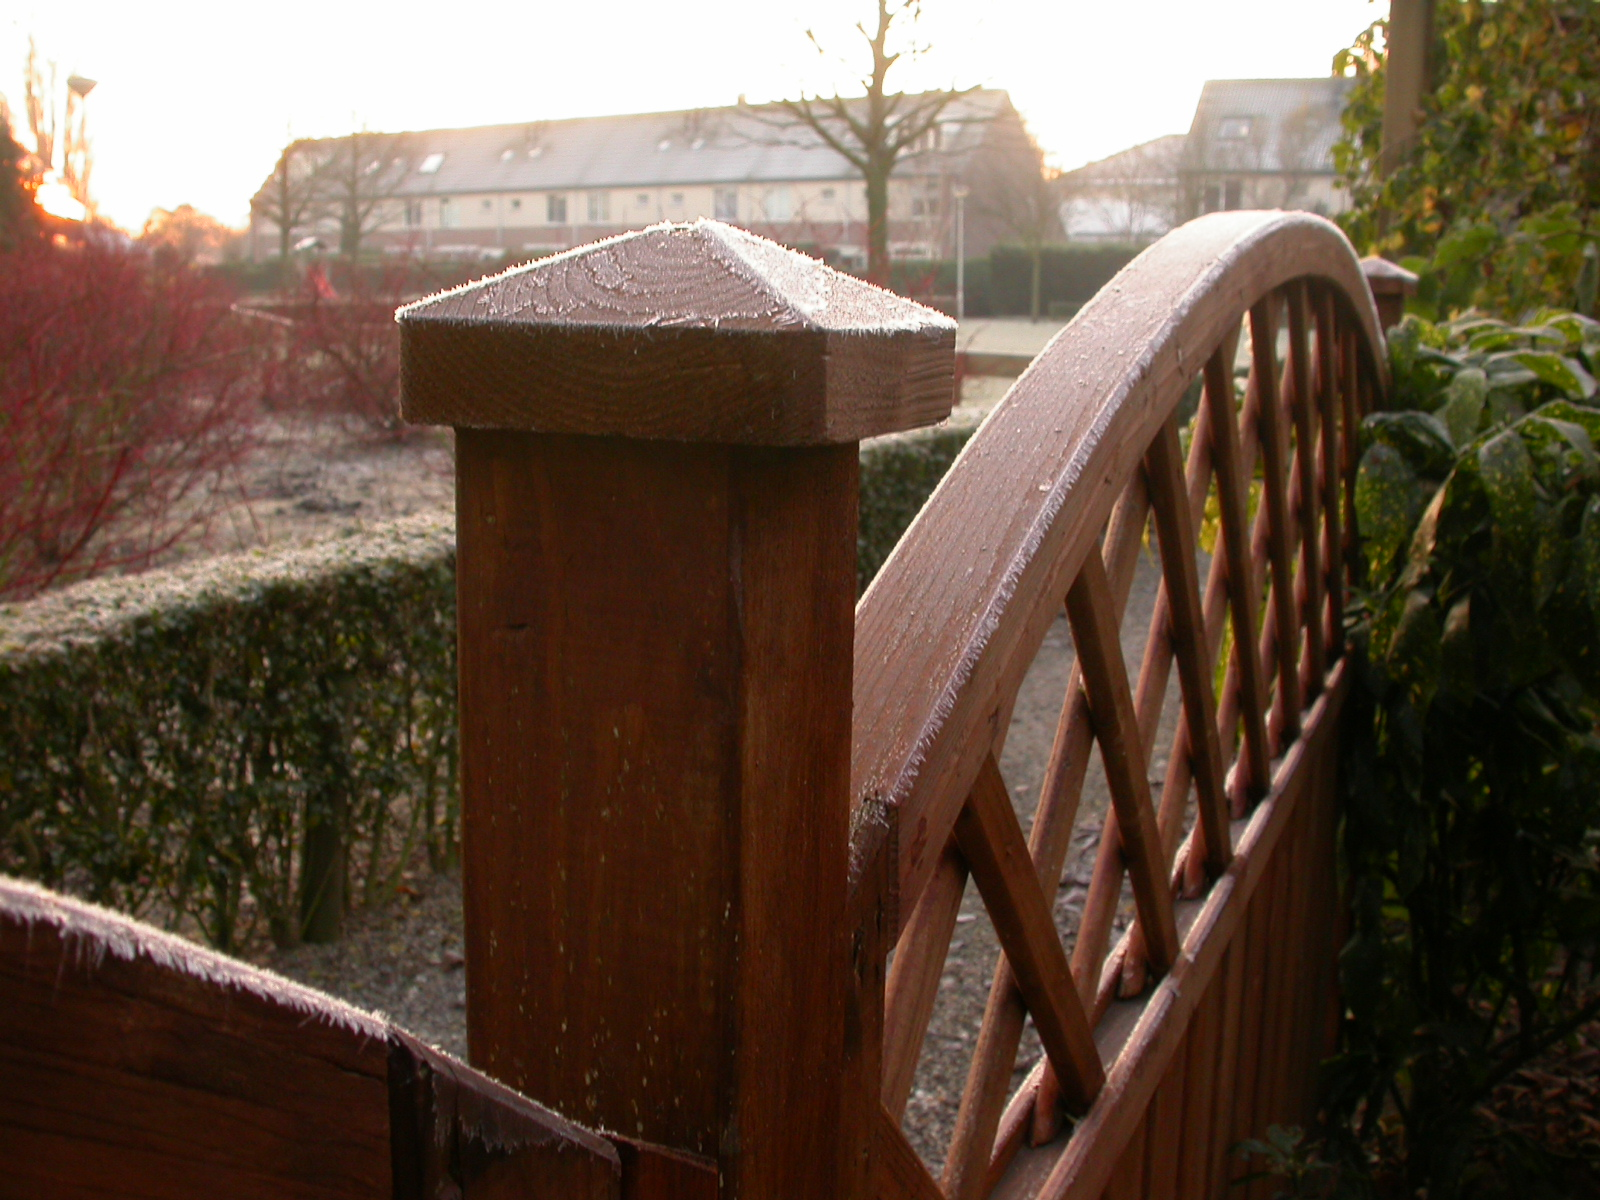 eva fence objects frozen winter wood wooden royalty free